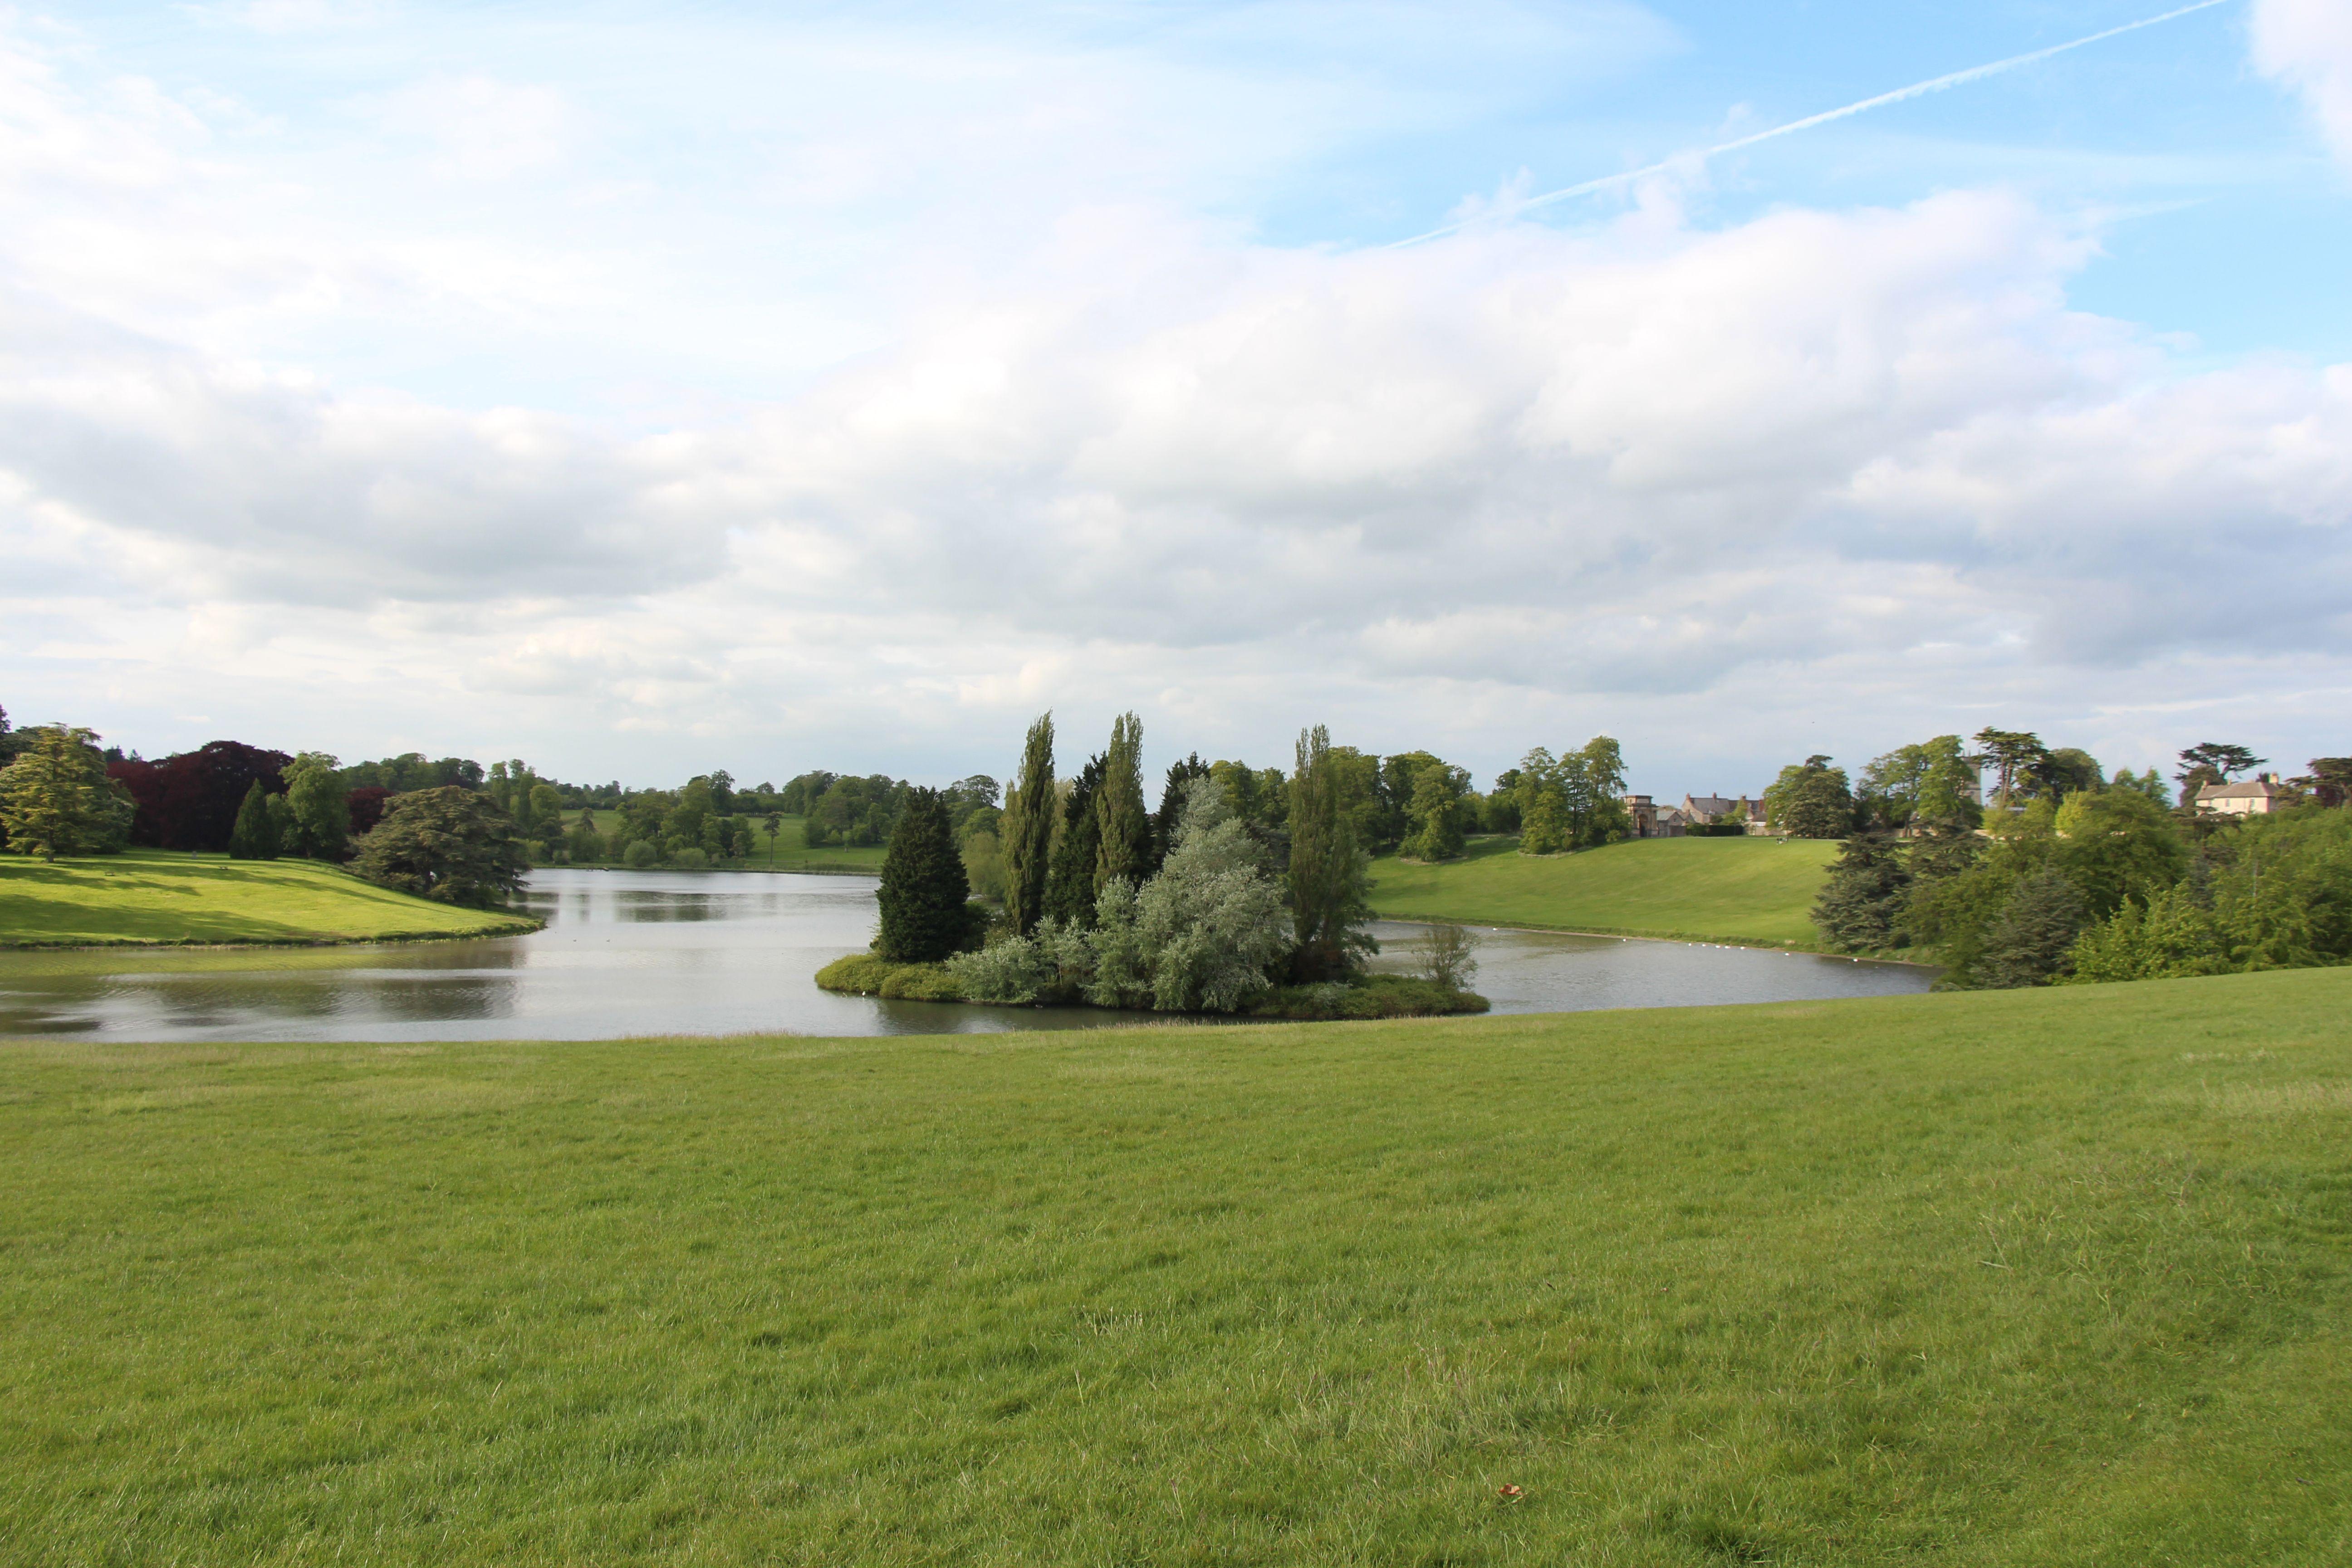 Blenheim palace park blenheim palace blenheim golf courses